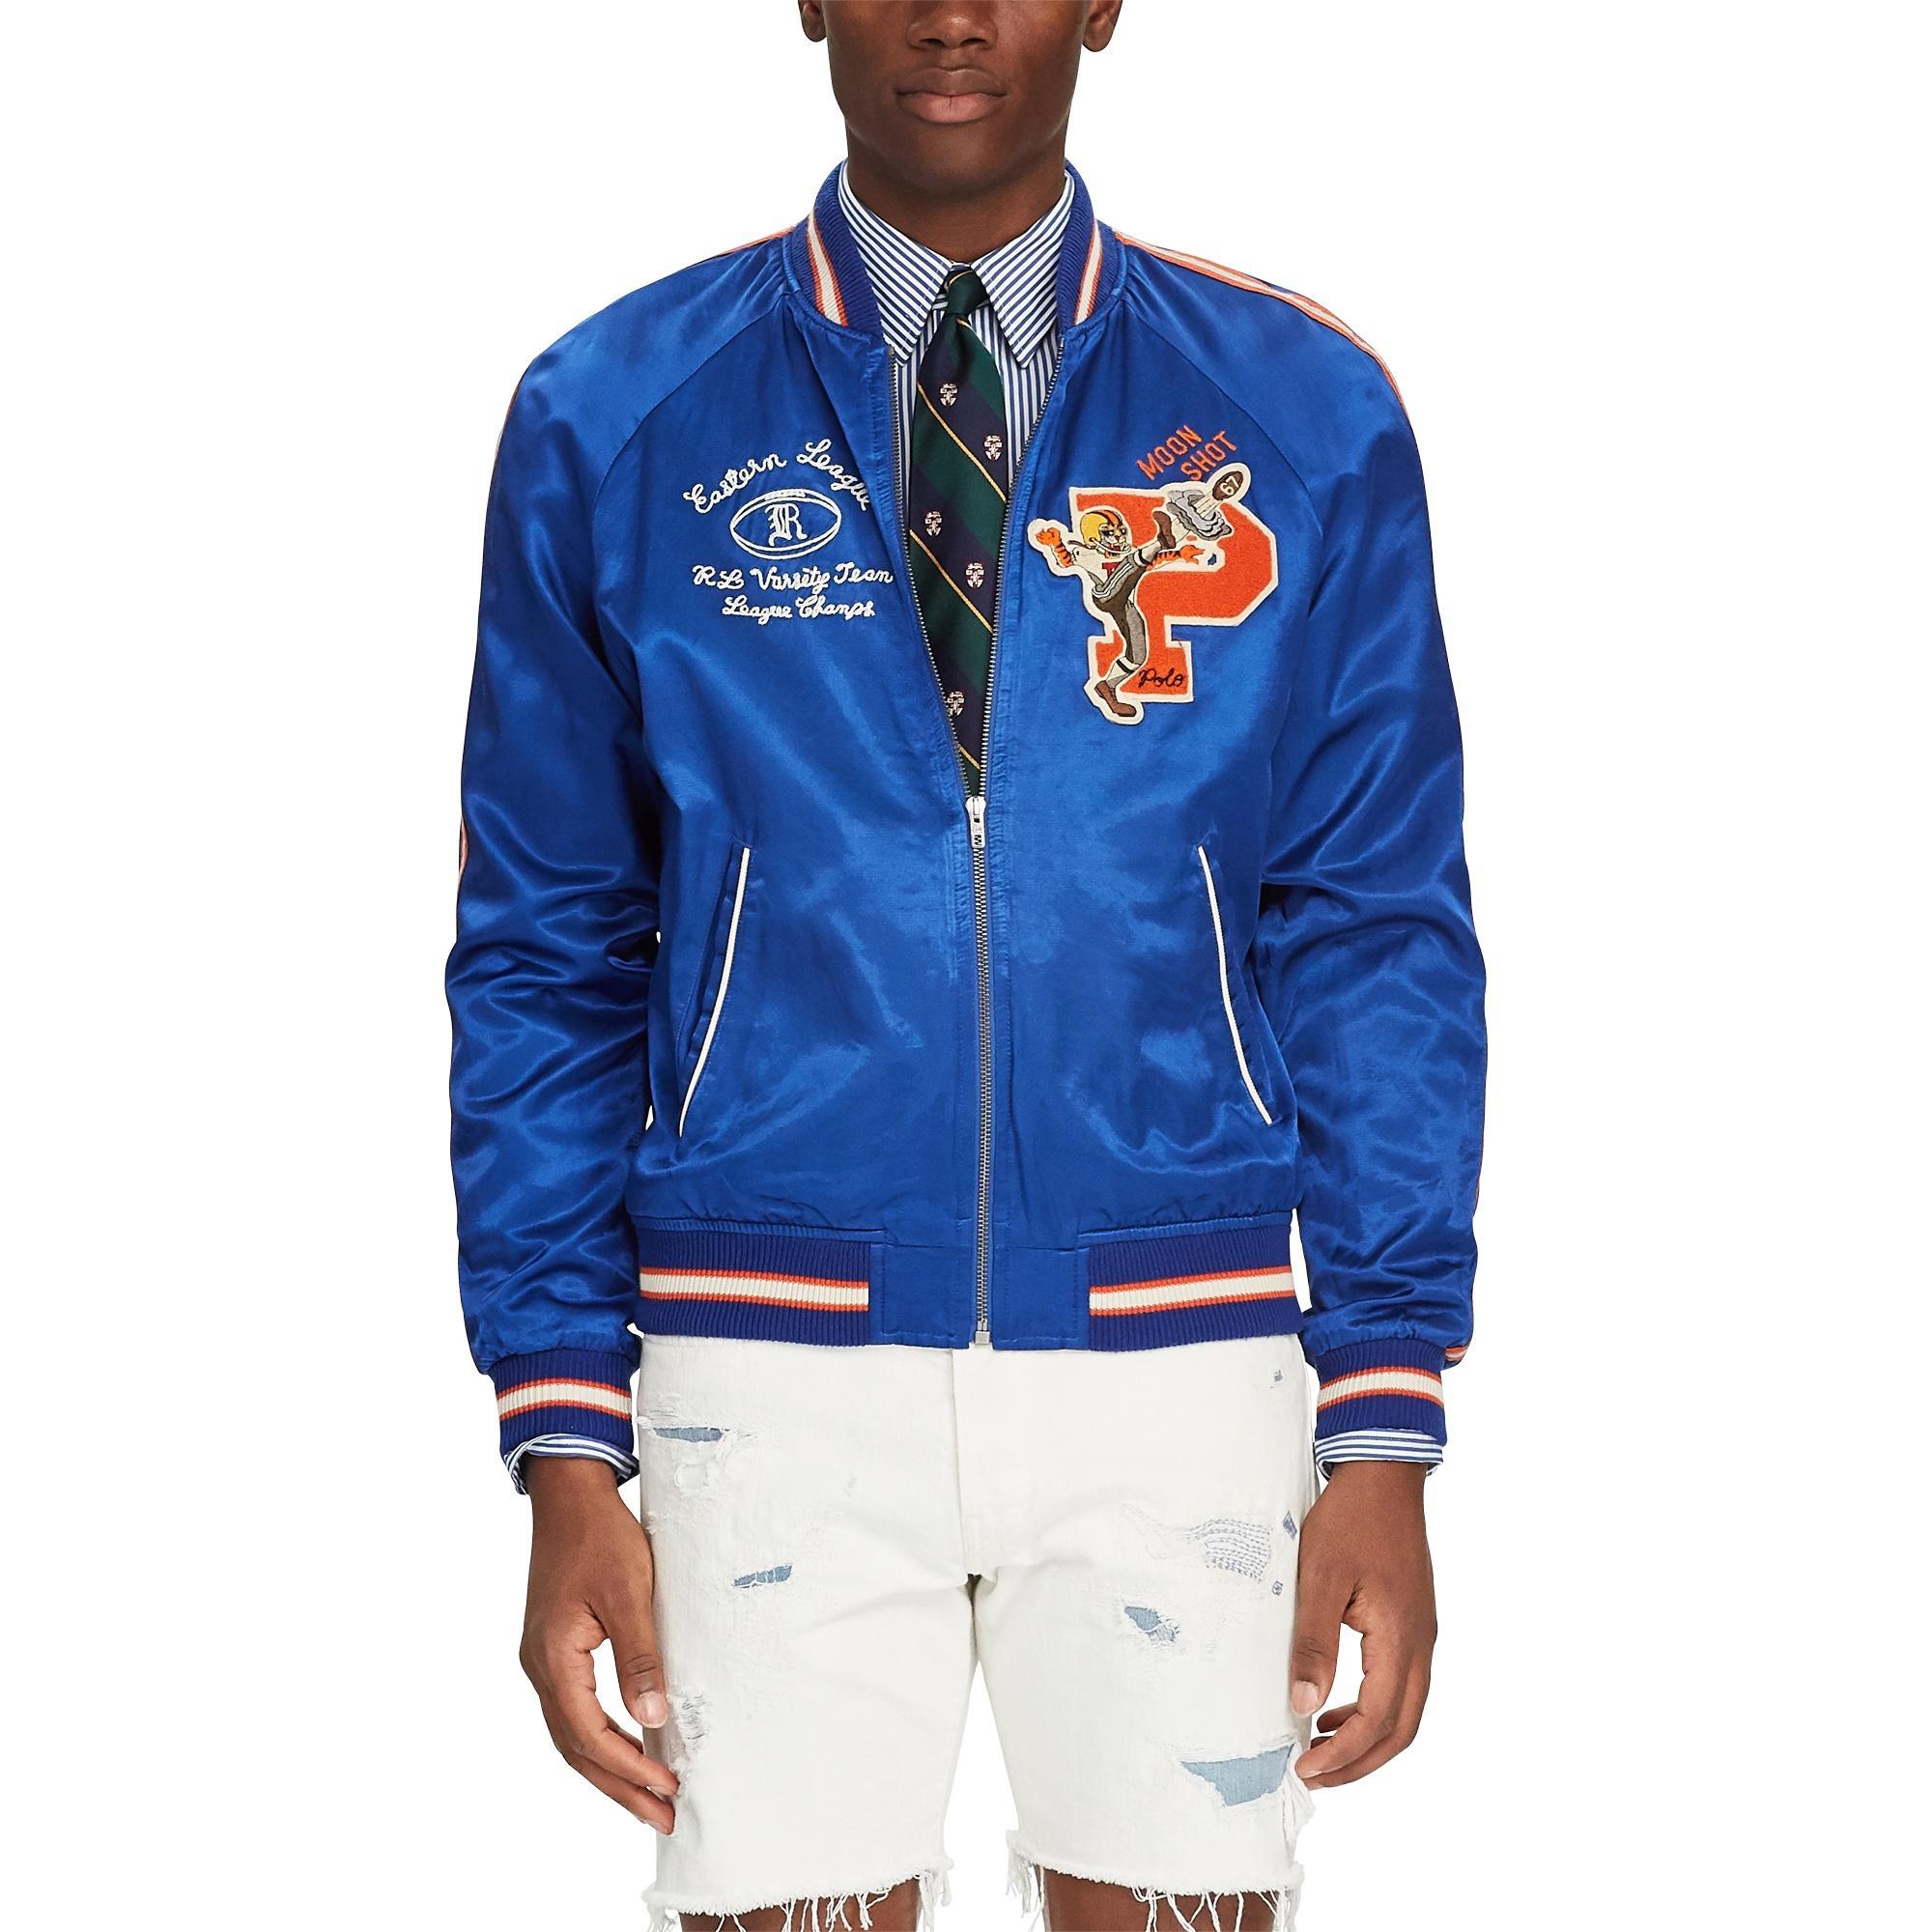 9266b271bd6 Polo Ralph Lauren Satin Souvenir Baseball Jacket in Blue for Men ...